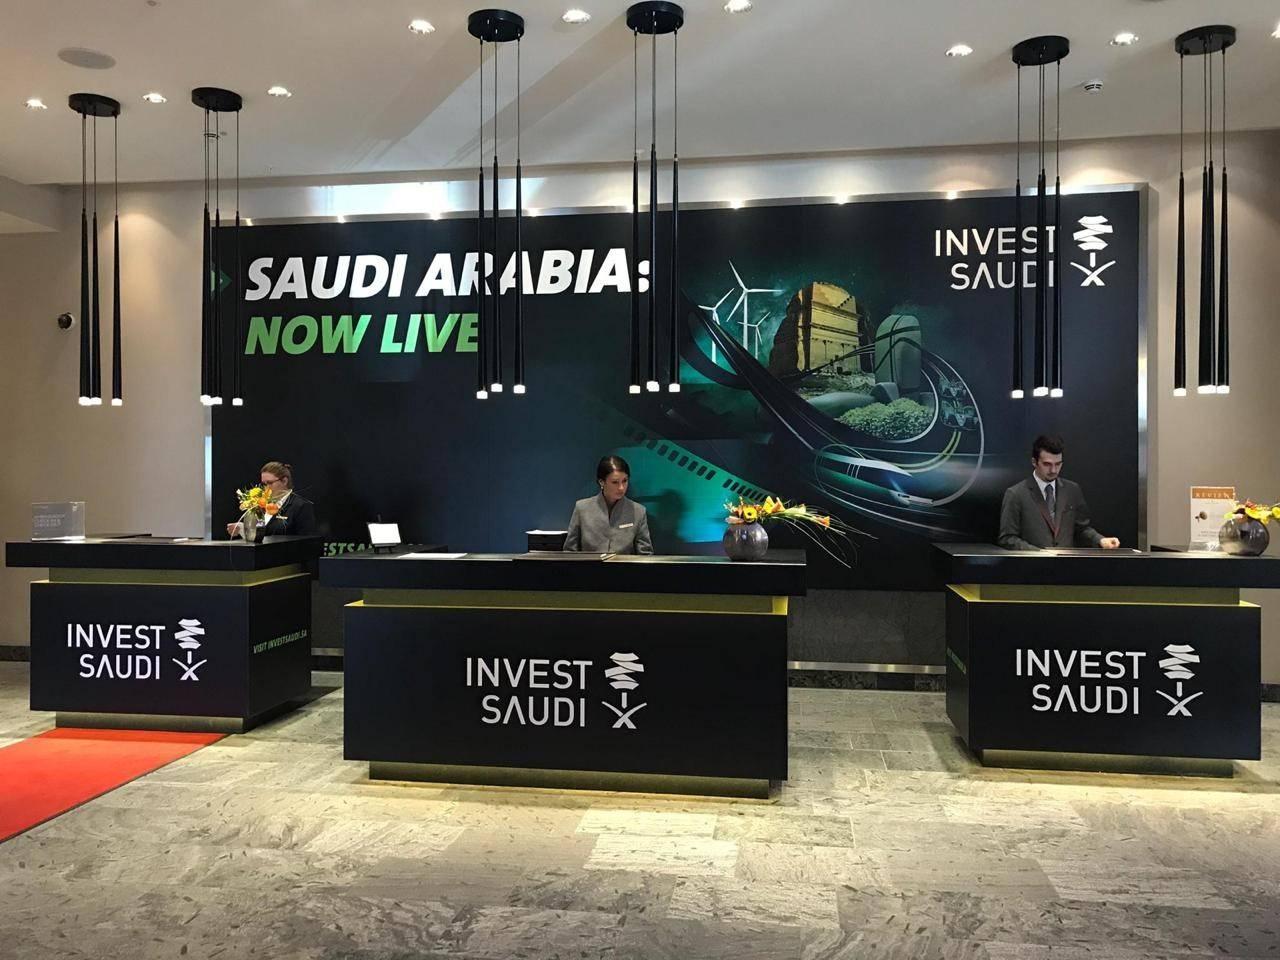 International companies in Saudi Arabia up by 54% in 2019